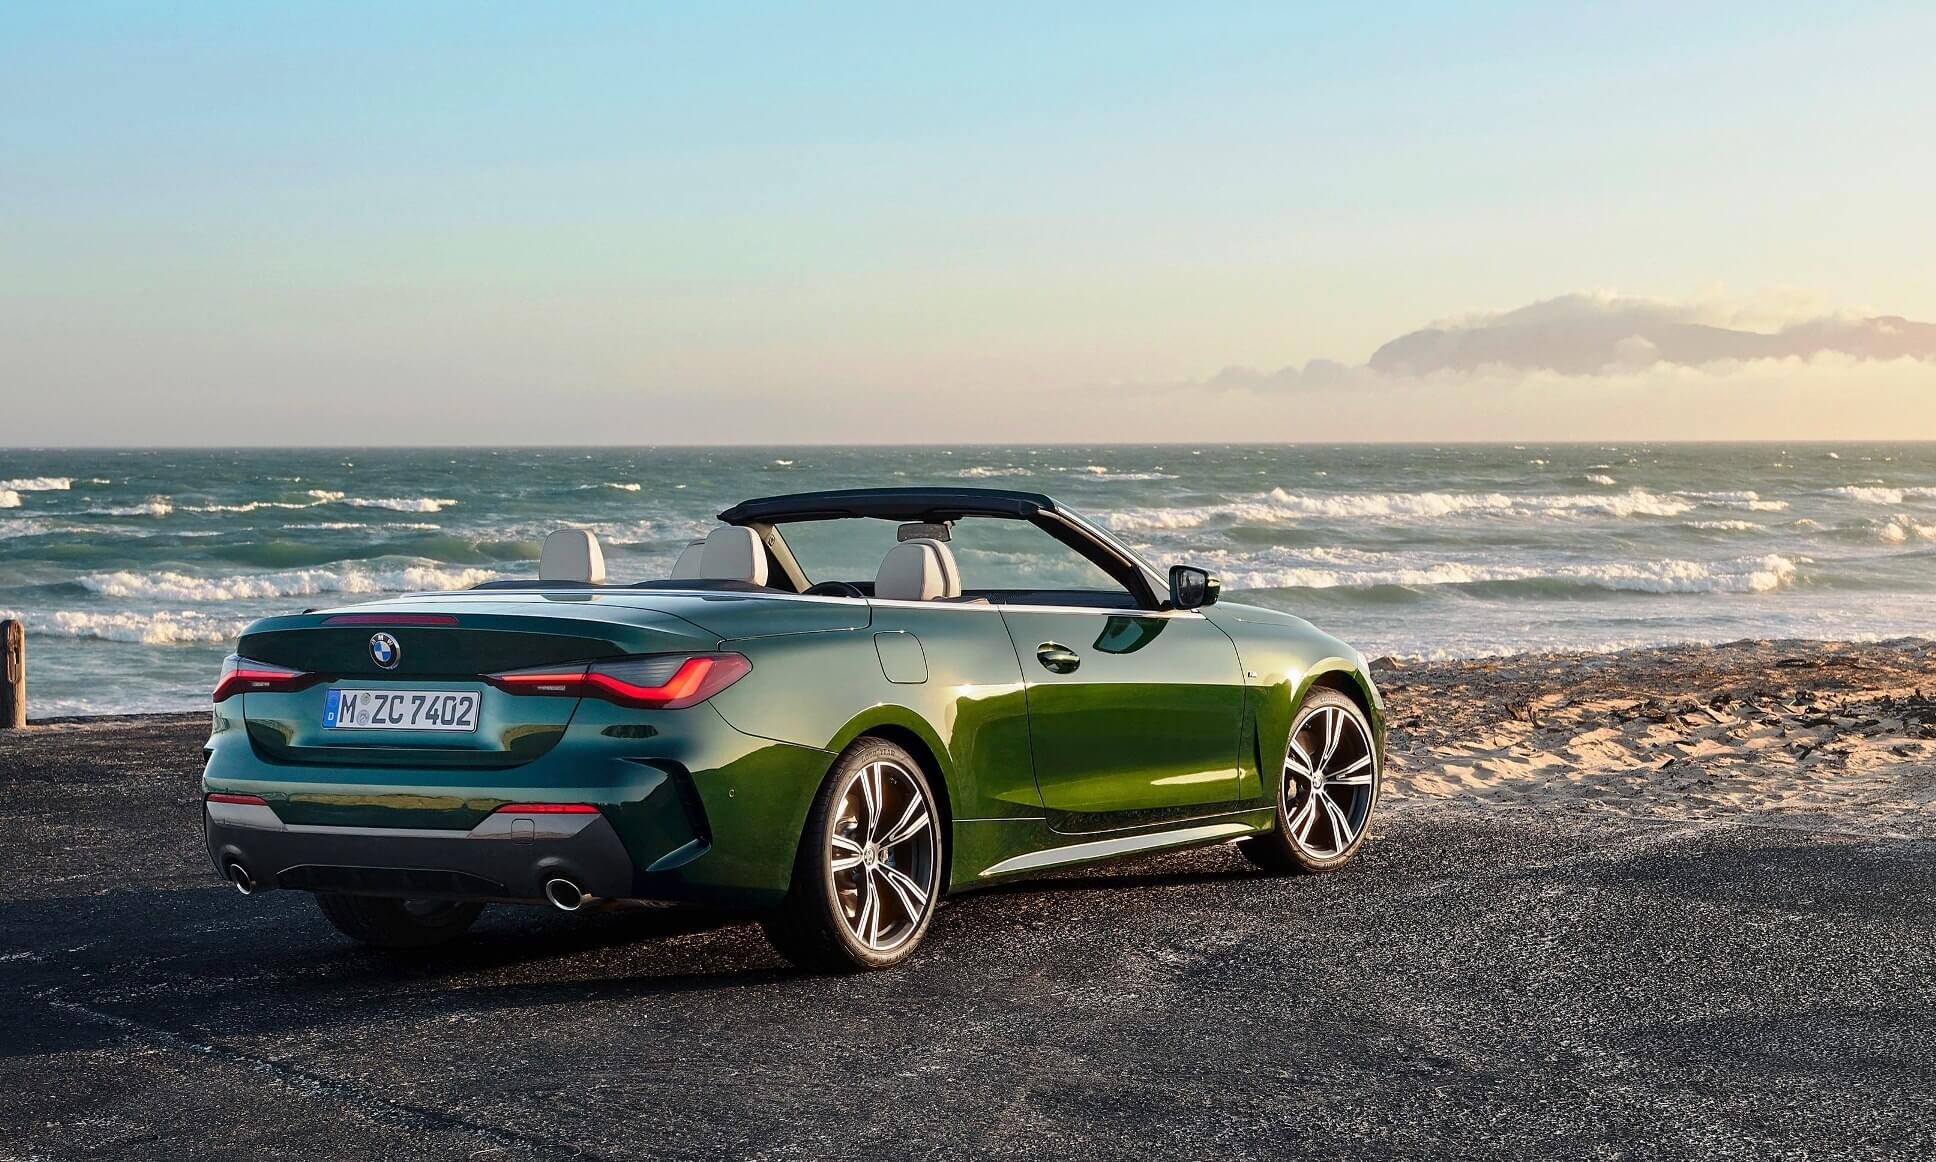 BMW 4 Series Convertible rear